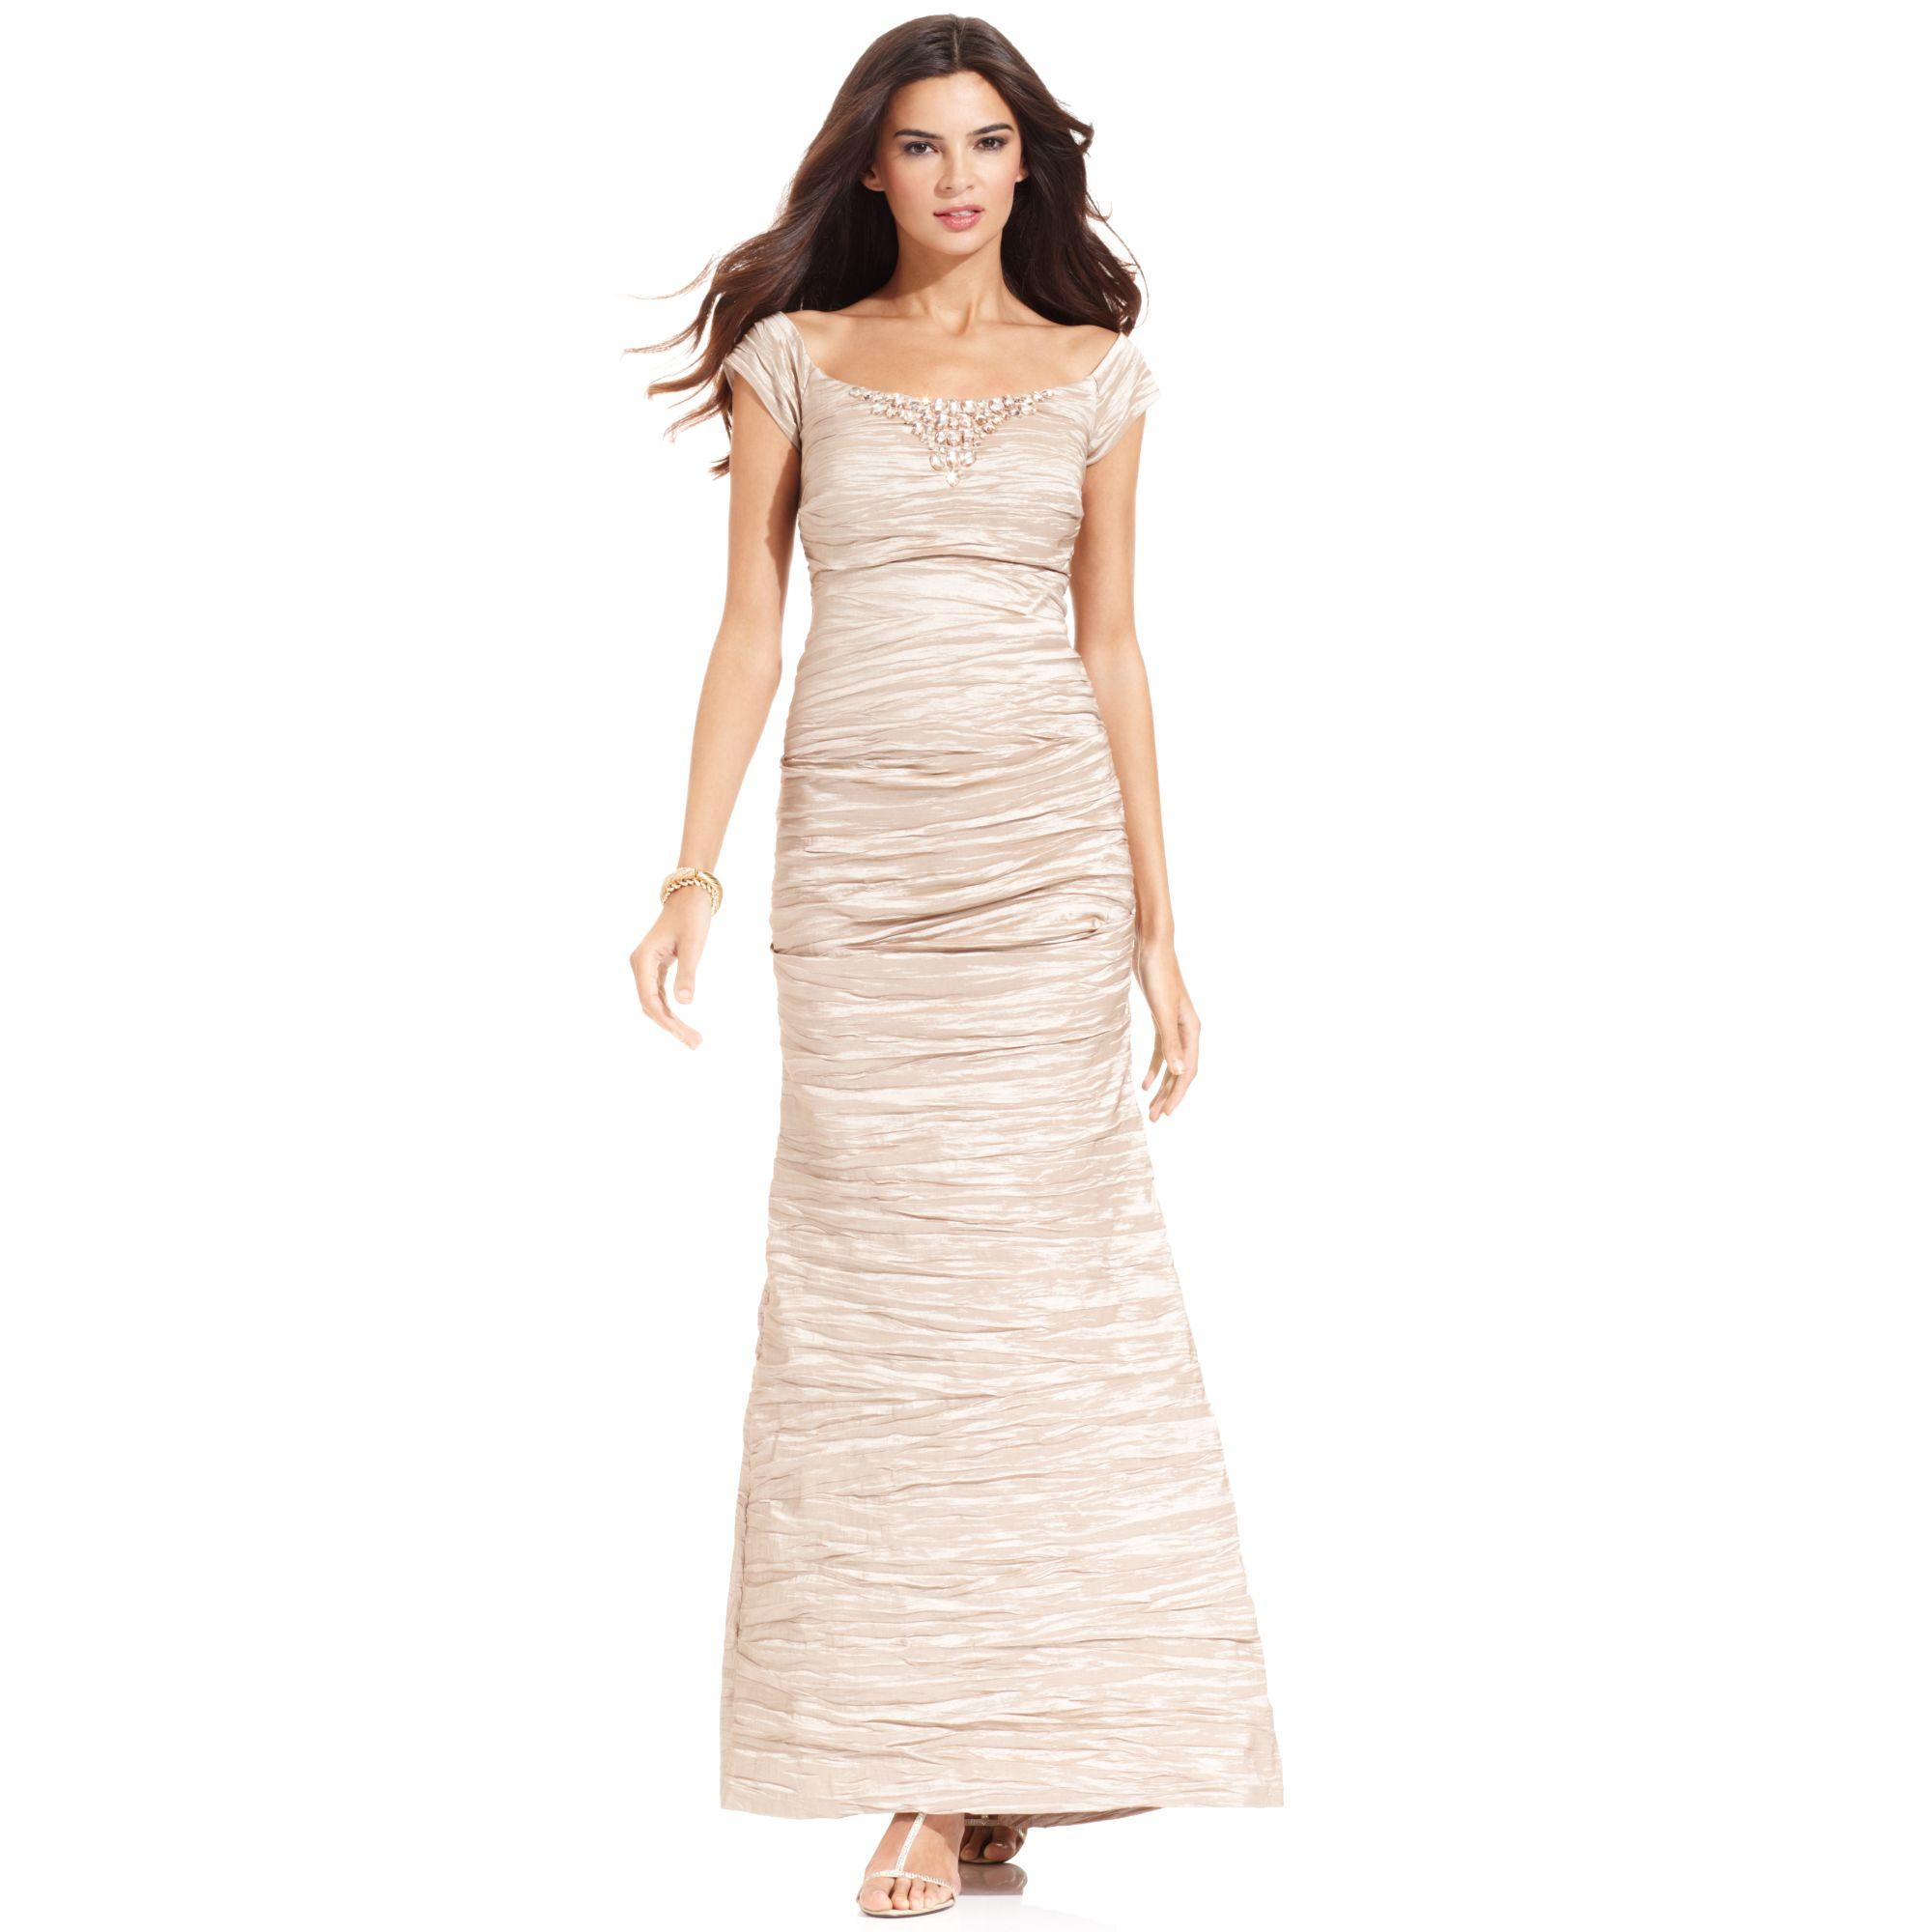 Alex Evenings Mother of the Bride Dresses | Dress images